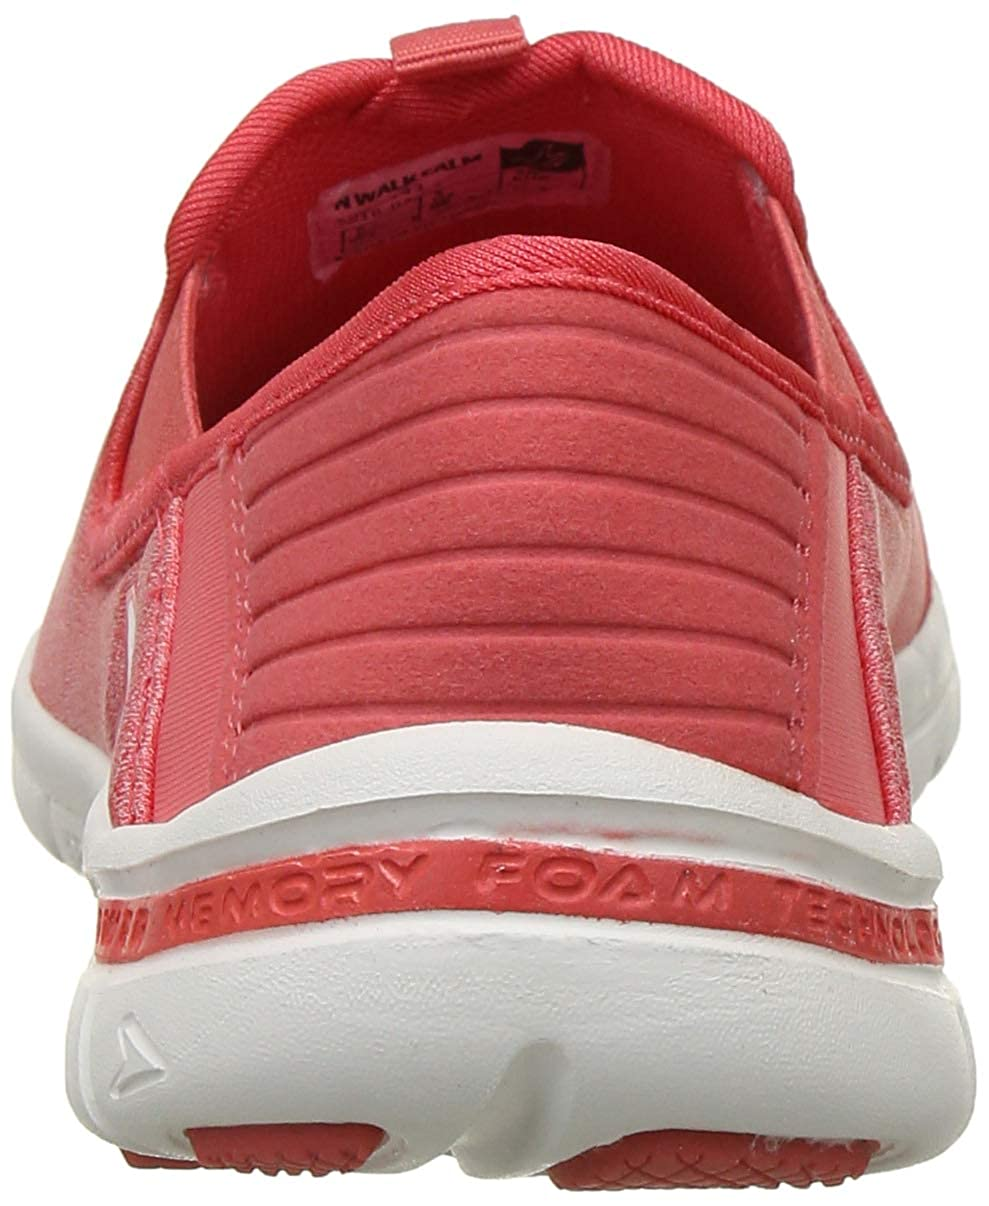 N Walk Calm Nordic Walking Shoes